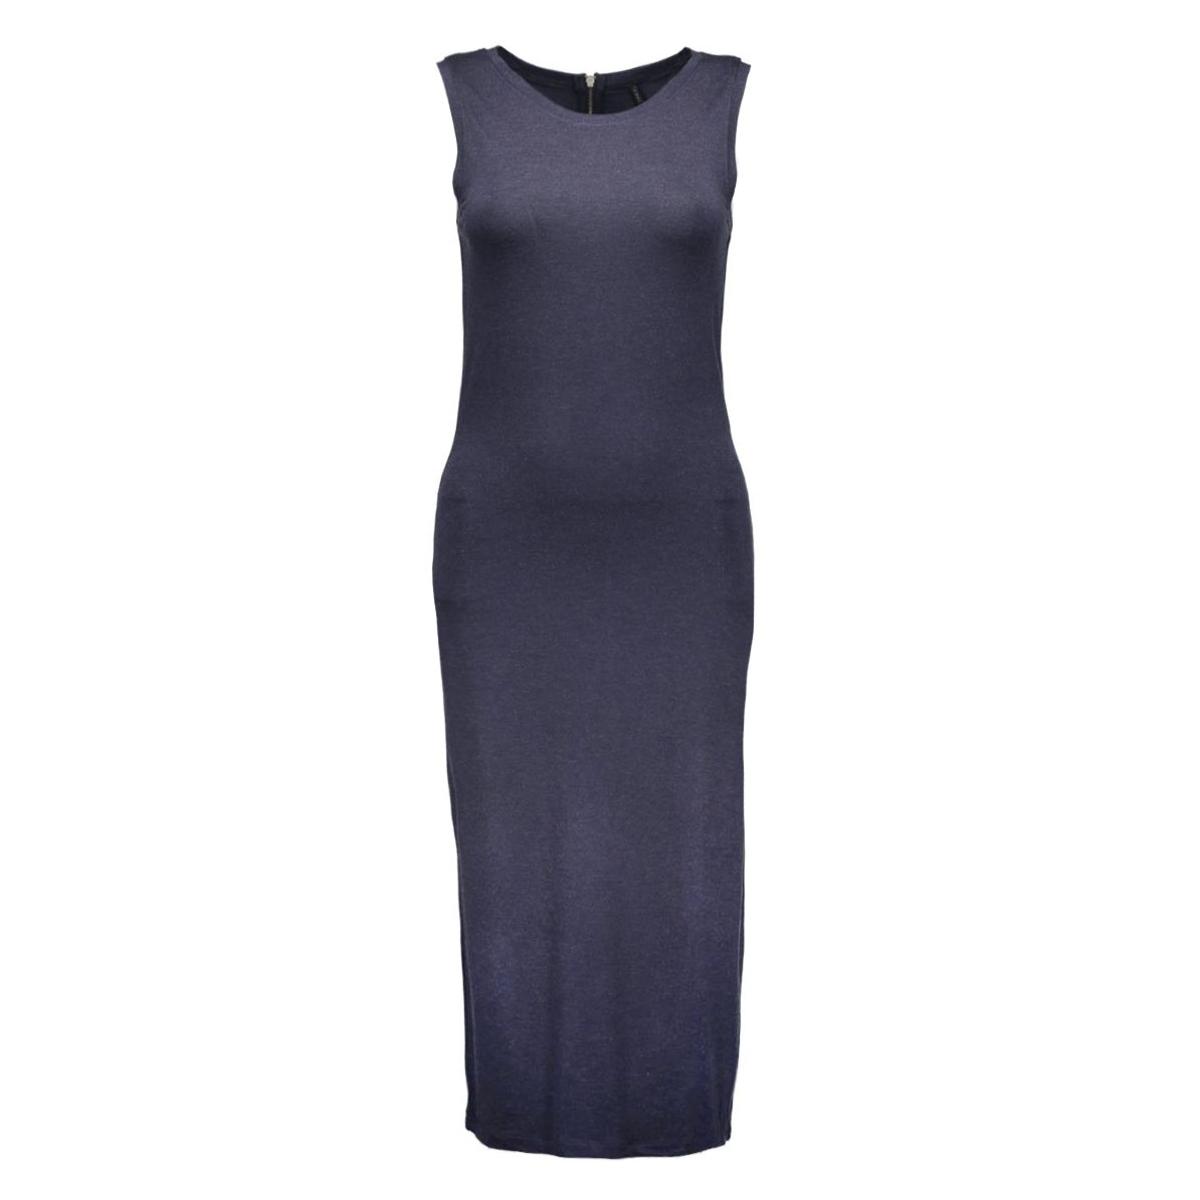 onlmojo june s/l dress ess 15119115 only jurk night sky/melange